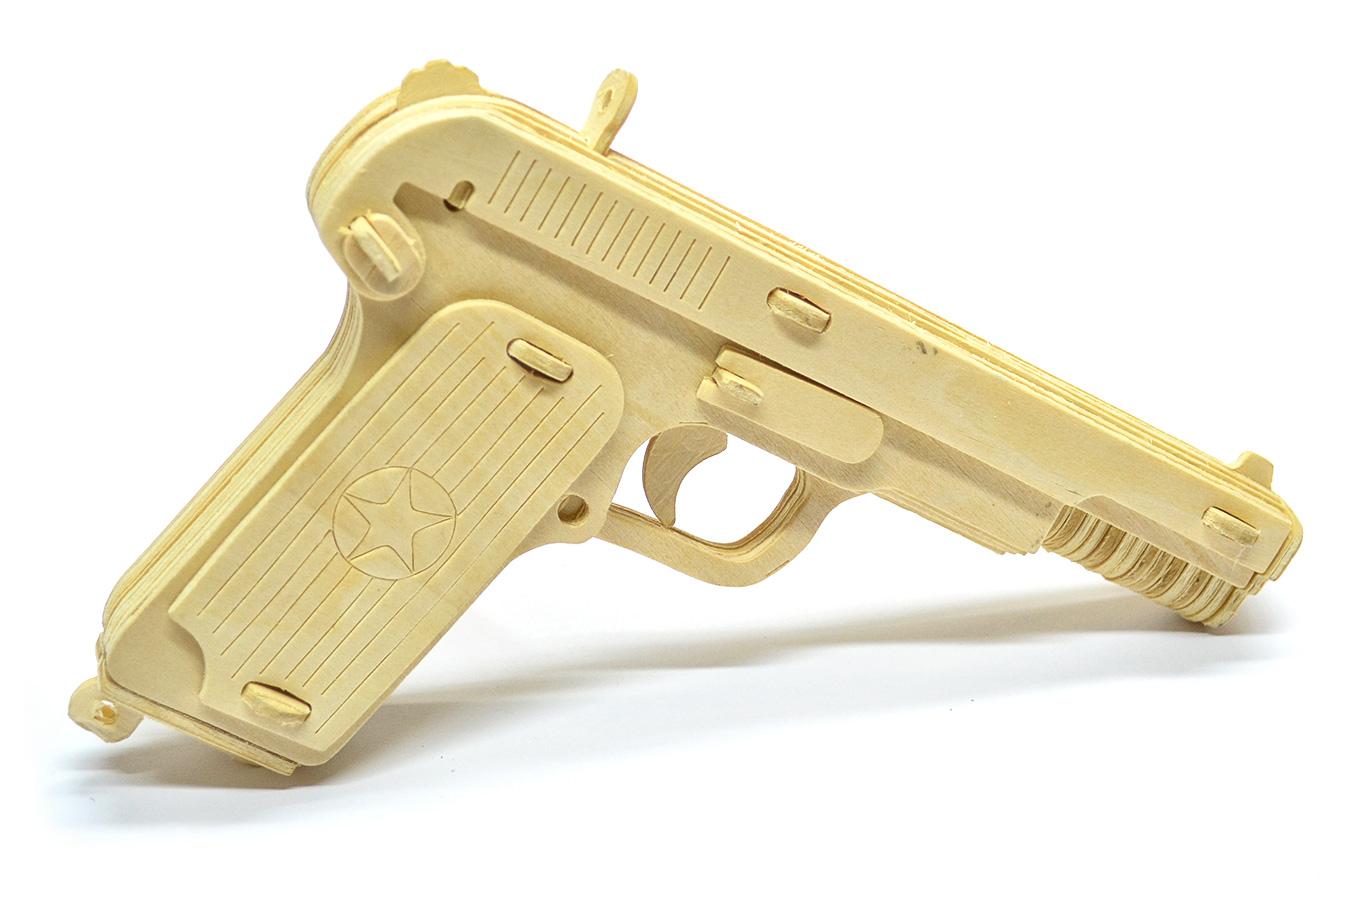 Деревянный макет пистолета Токарева ТТ